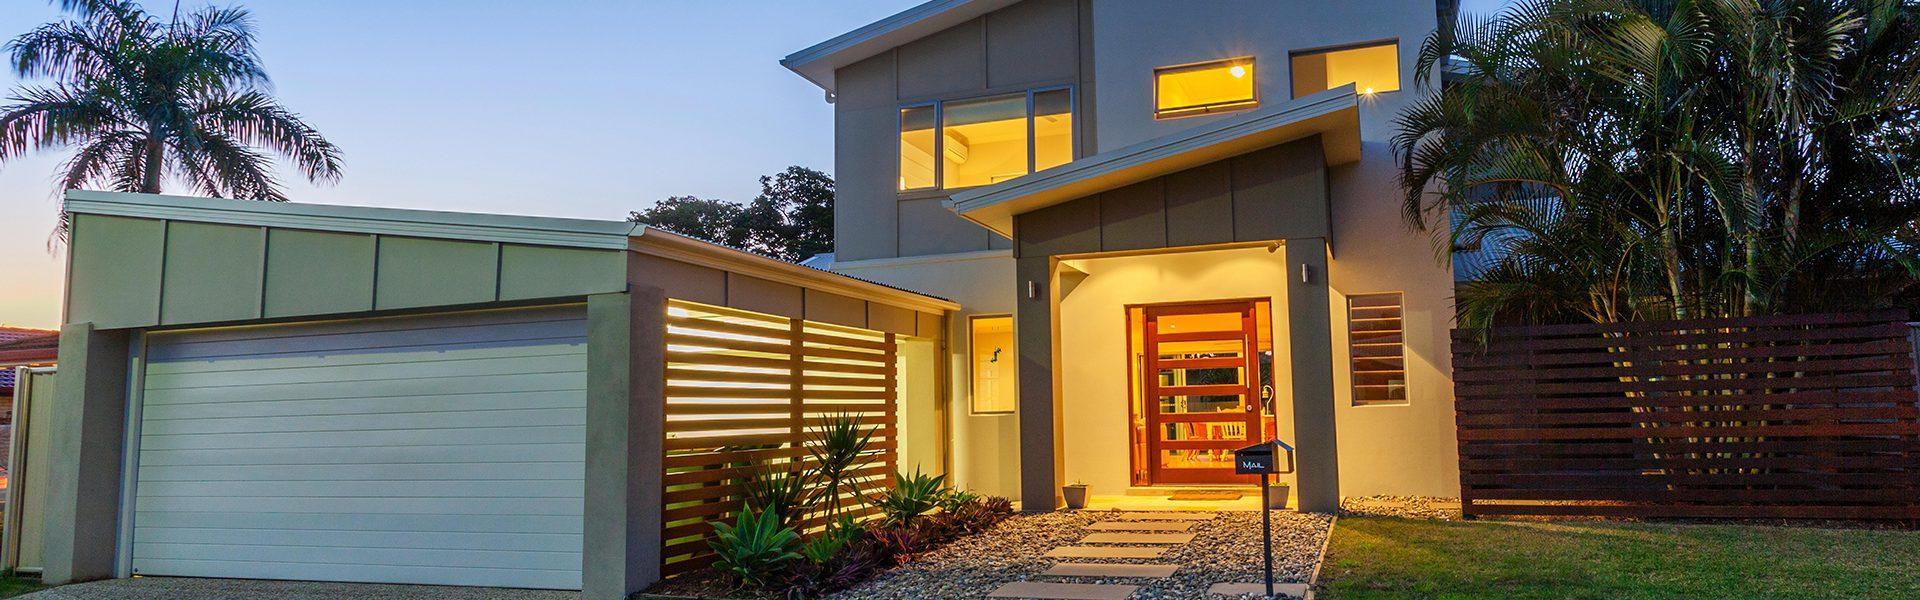 house energy rating australia